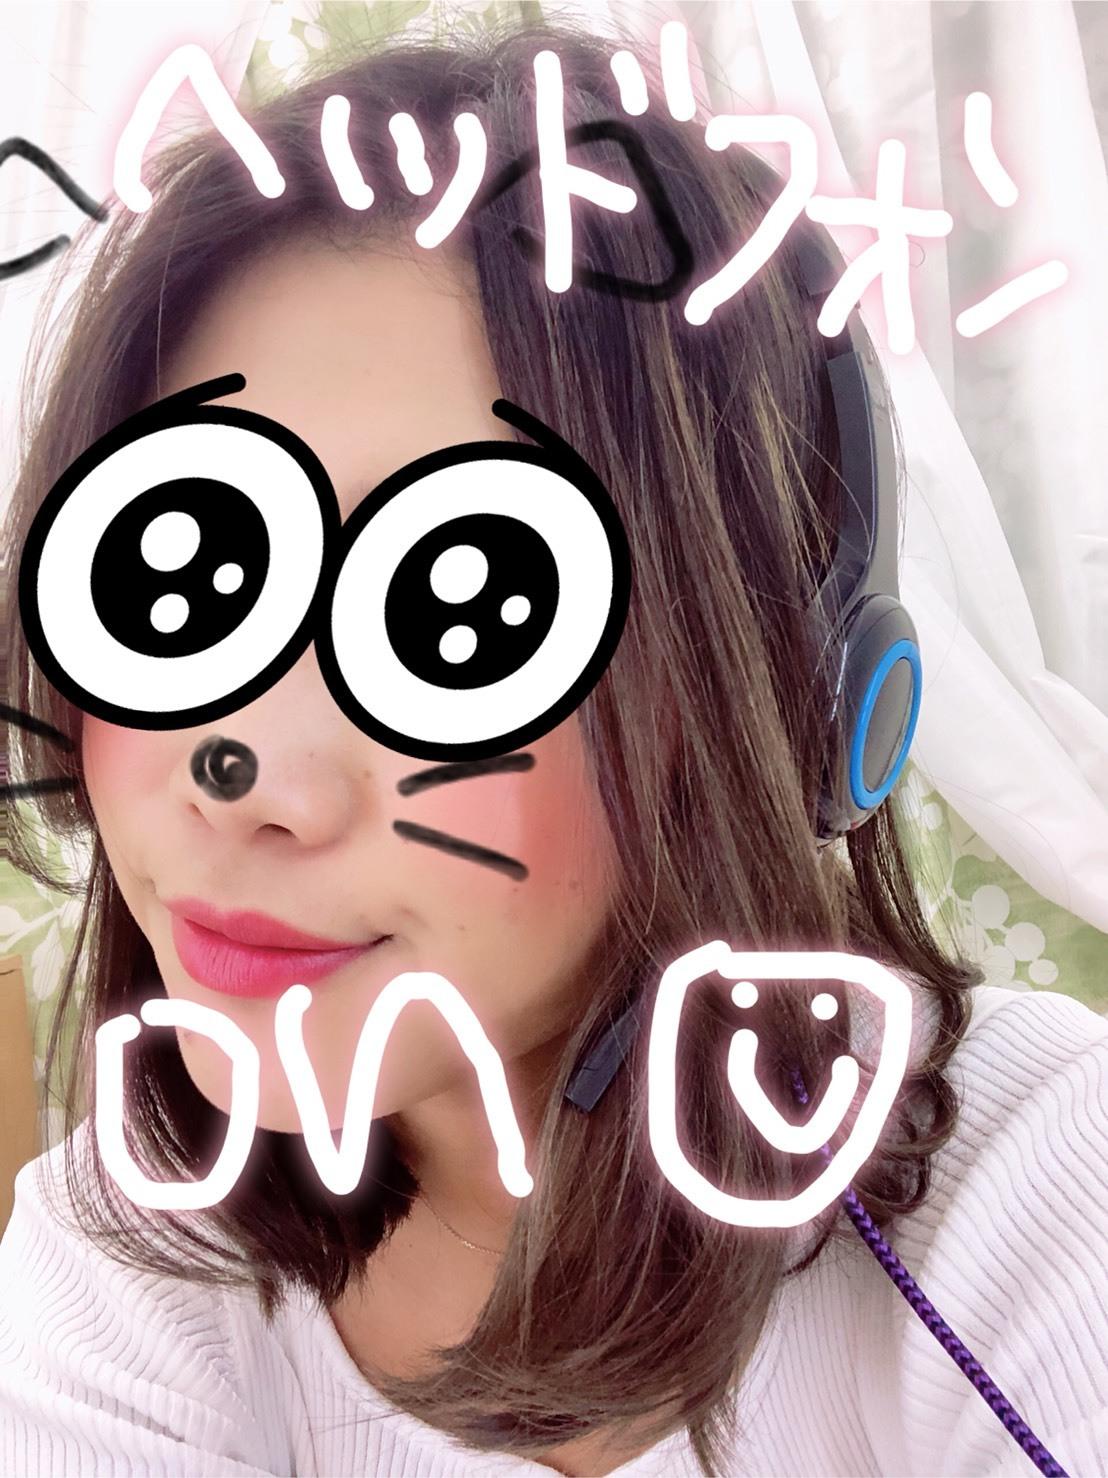 S__33193988.jpg